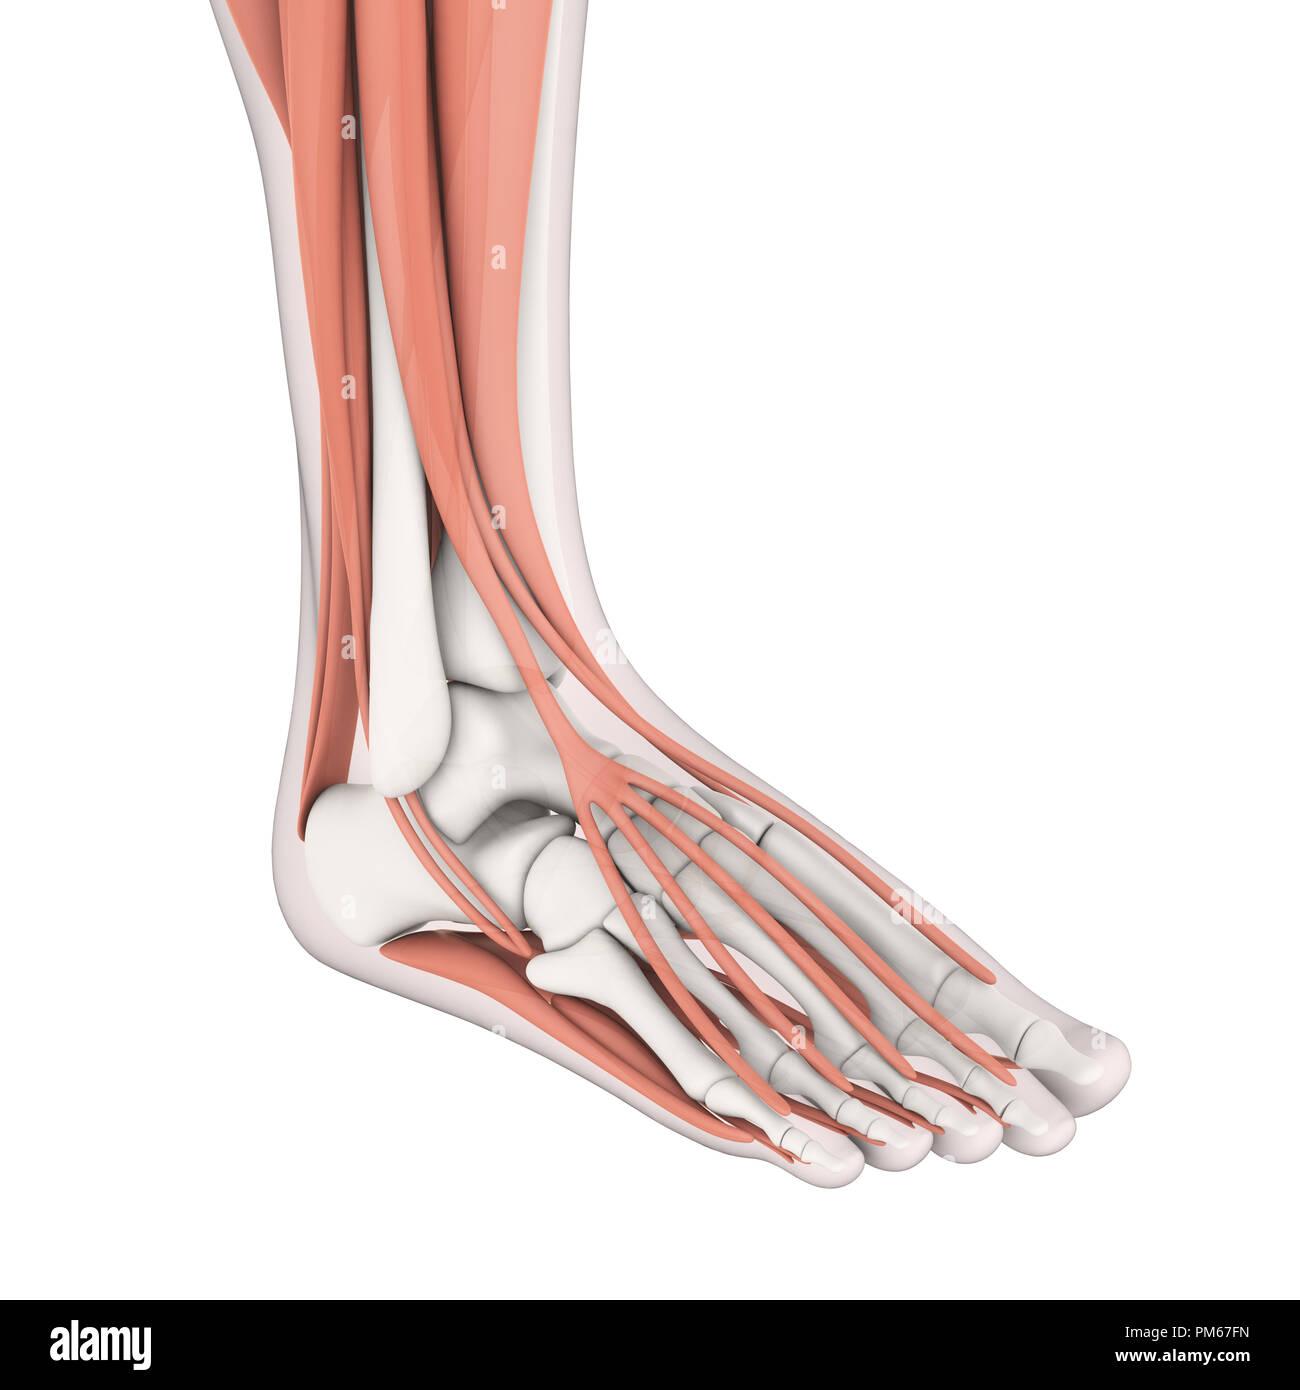 Human Foot Muscles Anatomy Stock Photo 218955177 Alamy